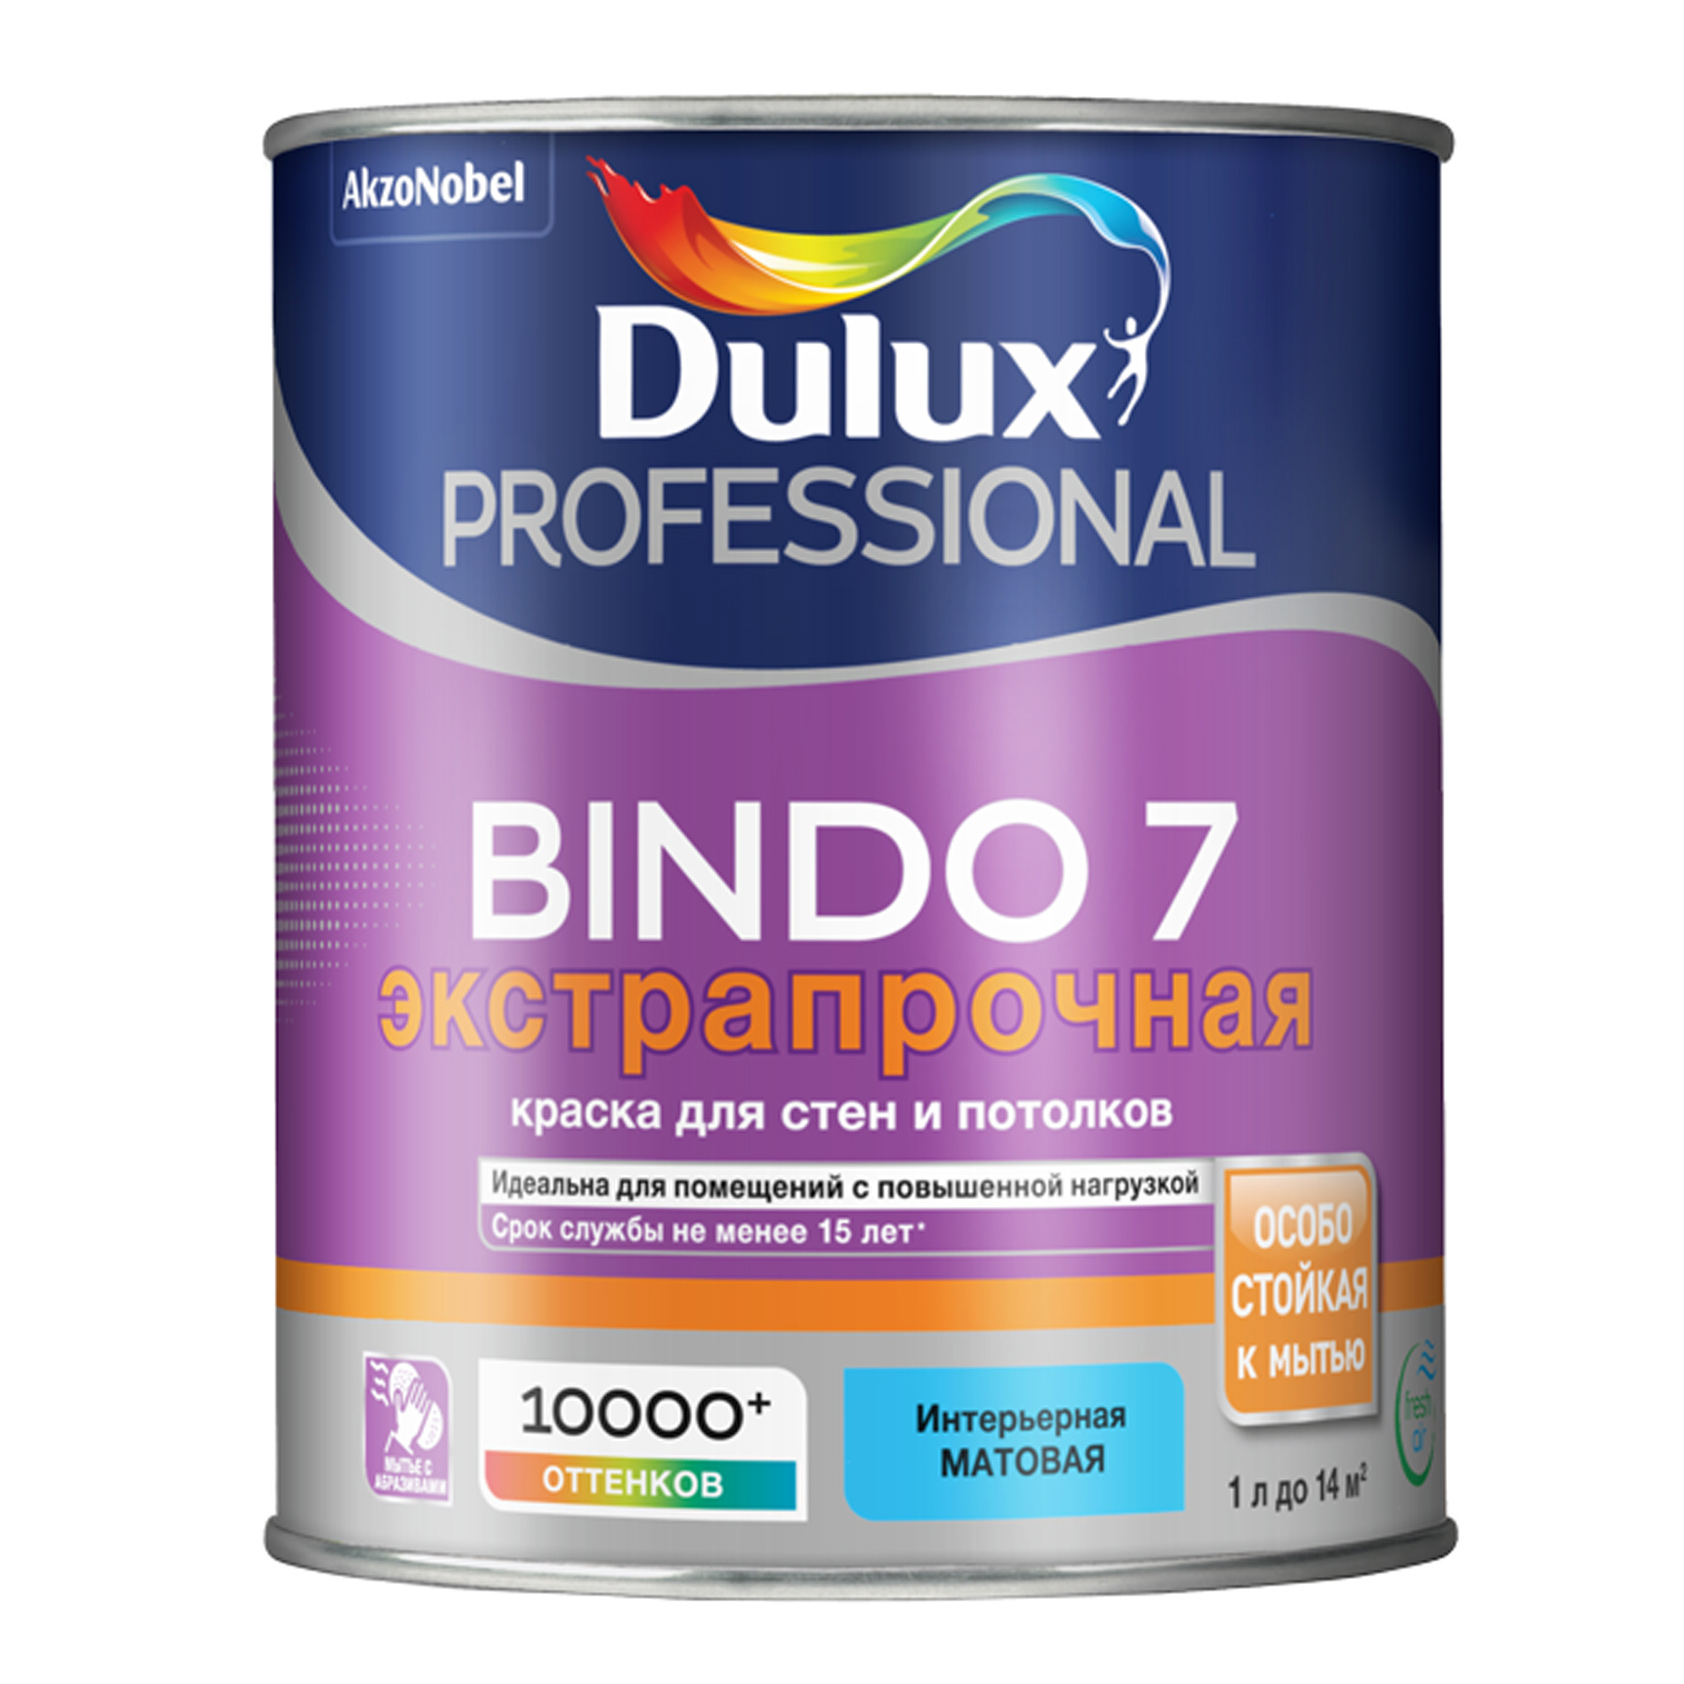 Краска для стен и потолков латексная экстрапрочная Dulux Professional Bindo 7 матовая база BC 0,9 л. фото